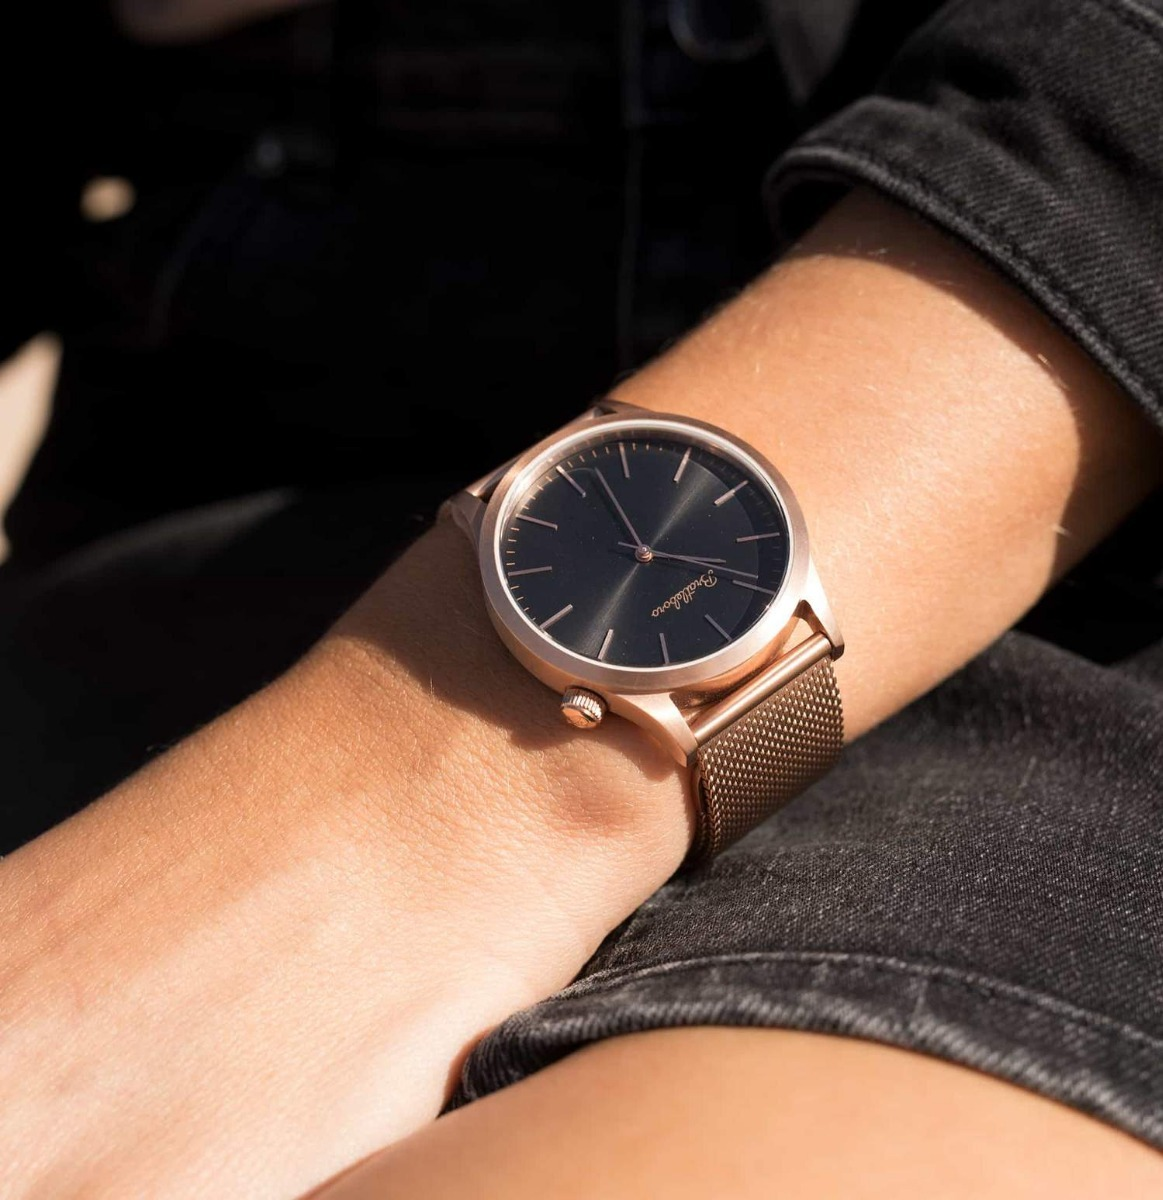 c17c010bd3cb reloj bratleboro - tayrona rose gold black. Cargando zoom.